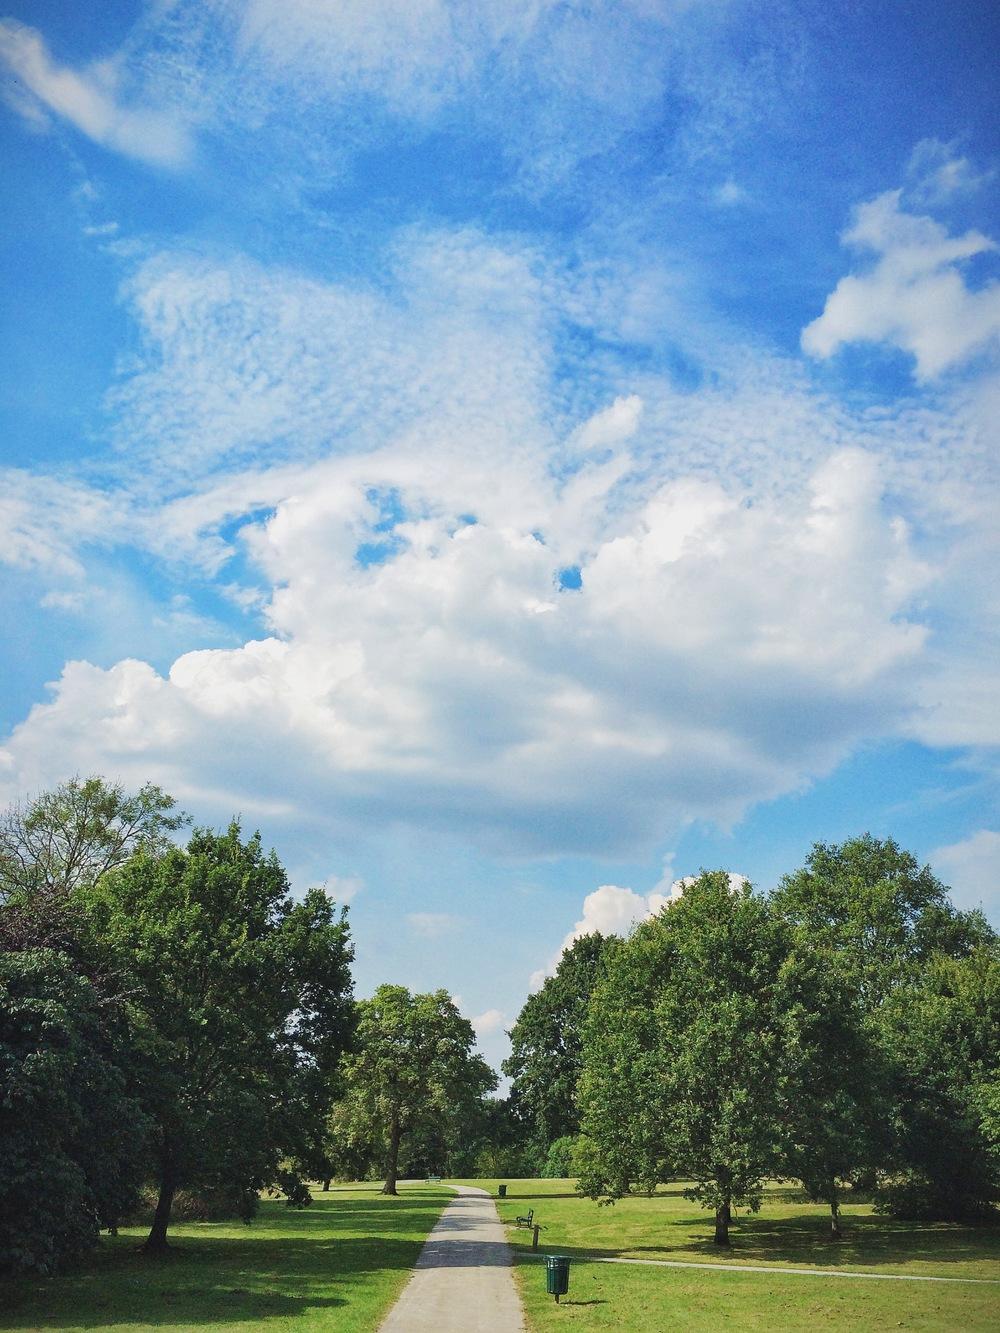 Photo 26-07-2014 16 01 21.jpg